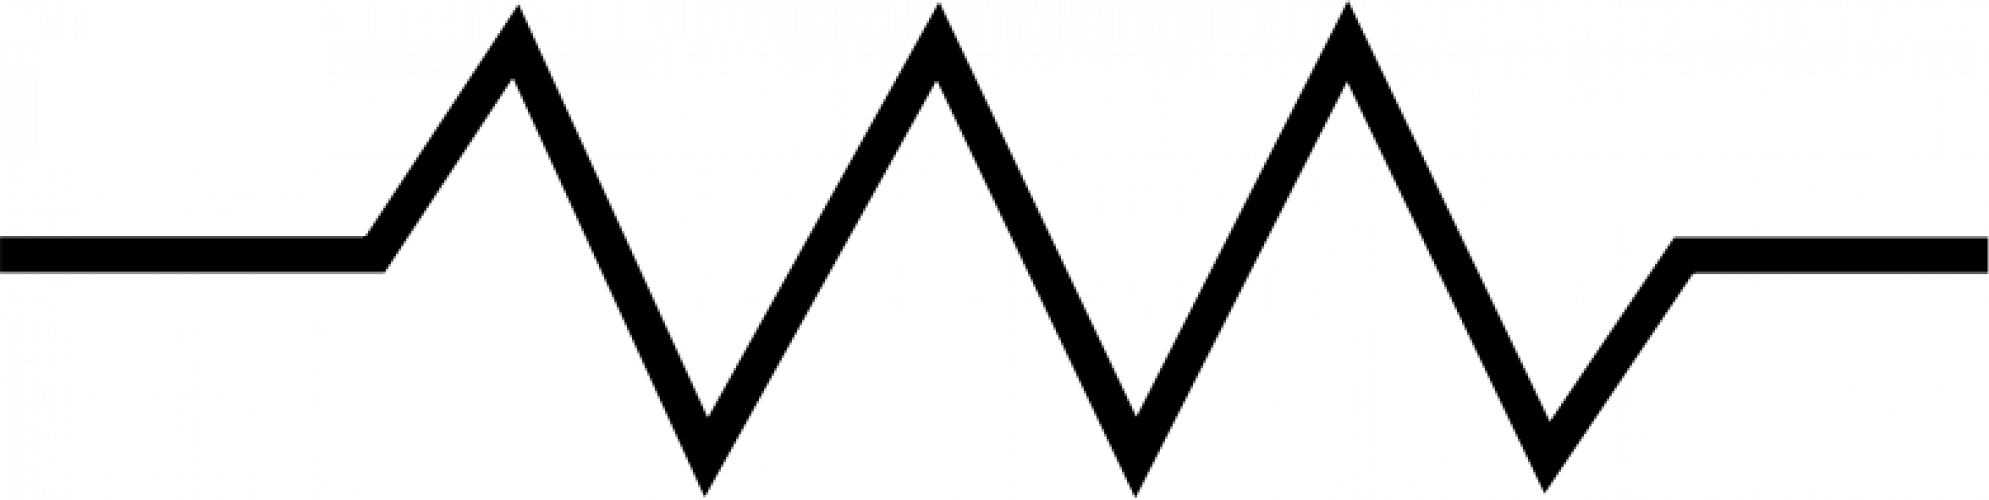 Variable Resistor Symbol - ClipArt Best